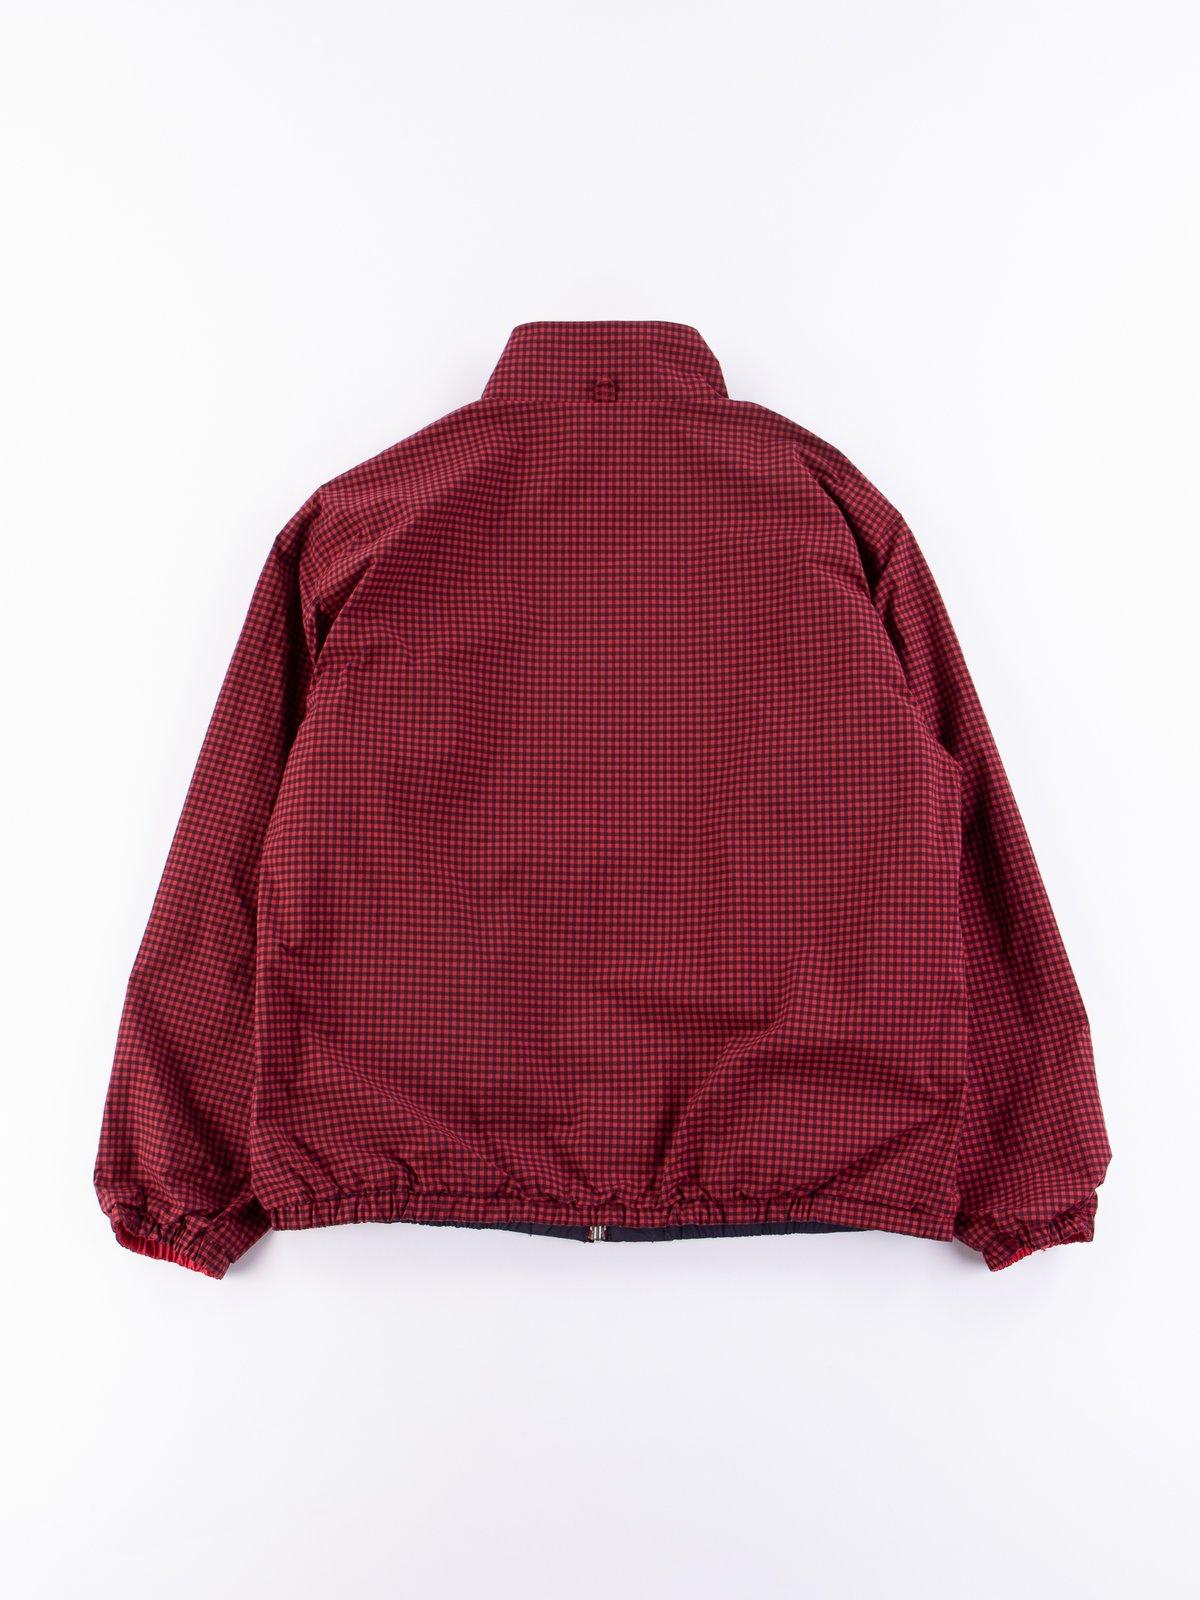 Red Gingham Reversible Jacket - Image 5